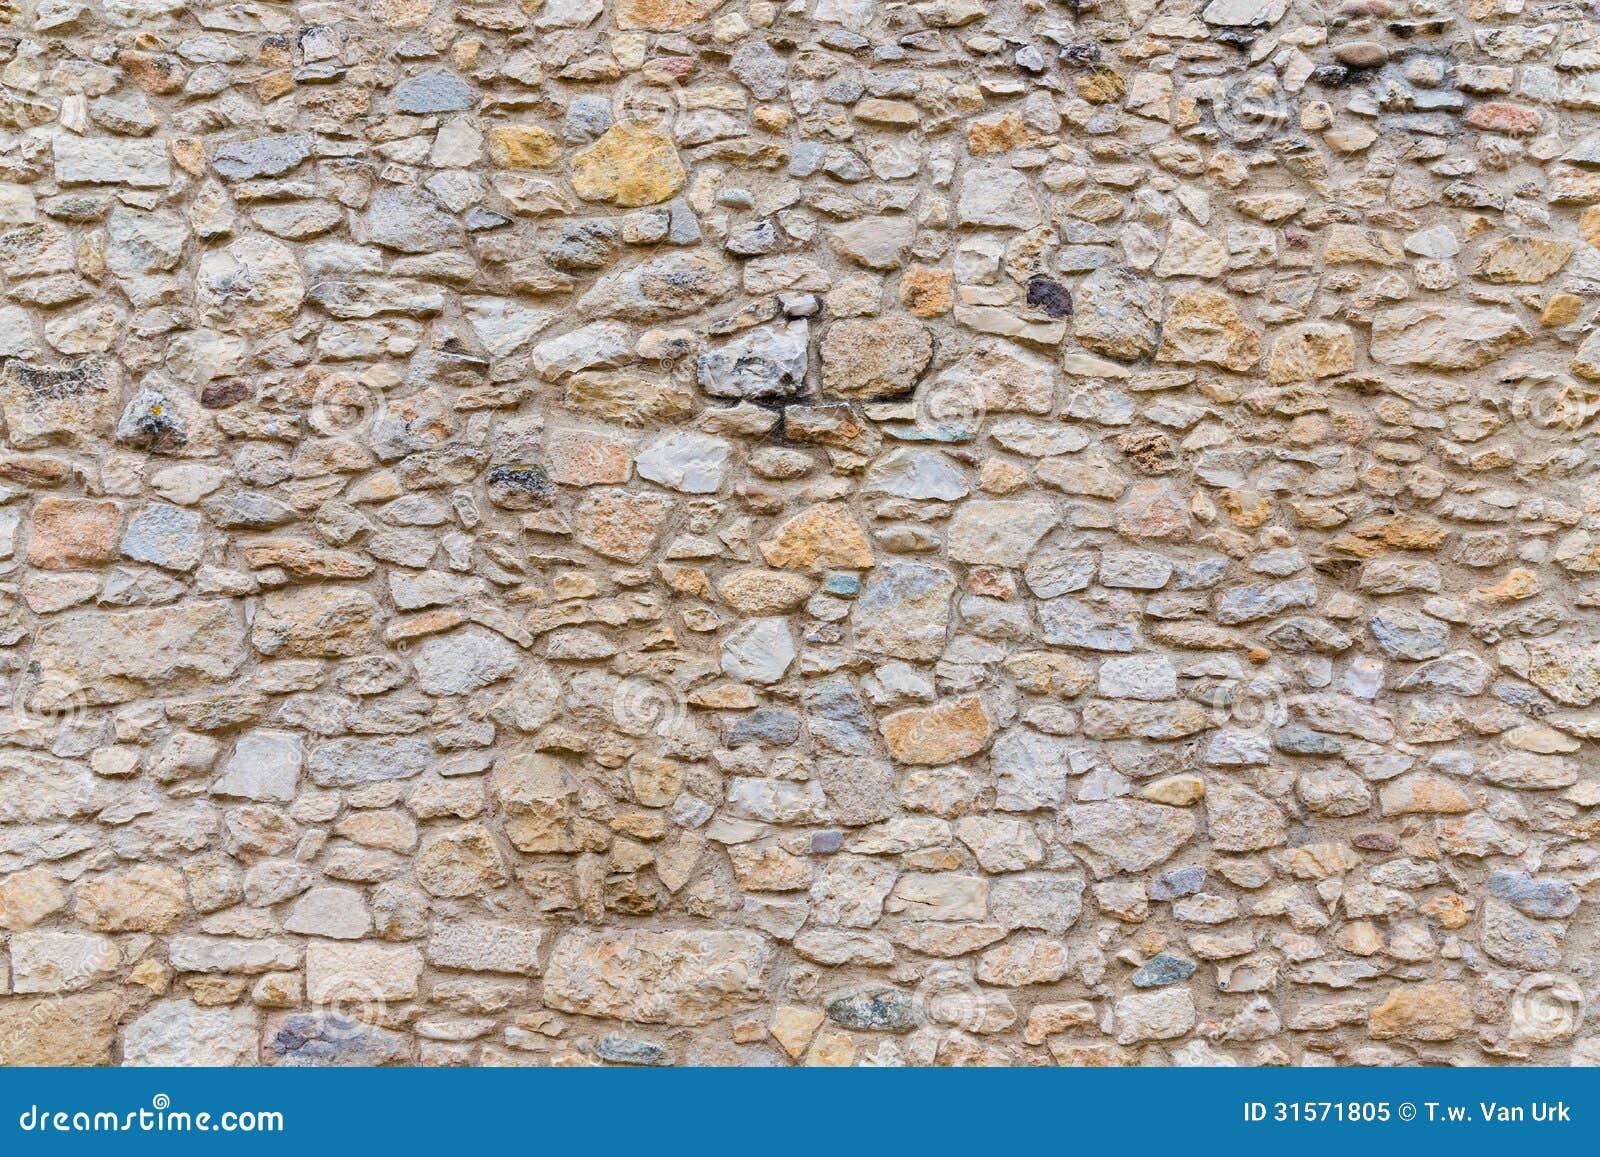 Rough Granite Block : Rough textured old stone block wall royalty free stock